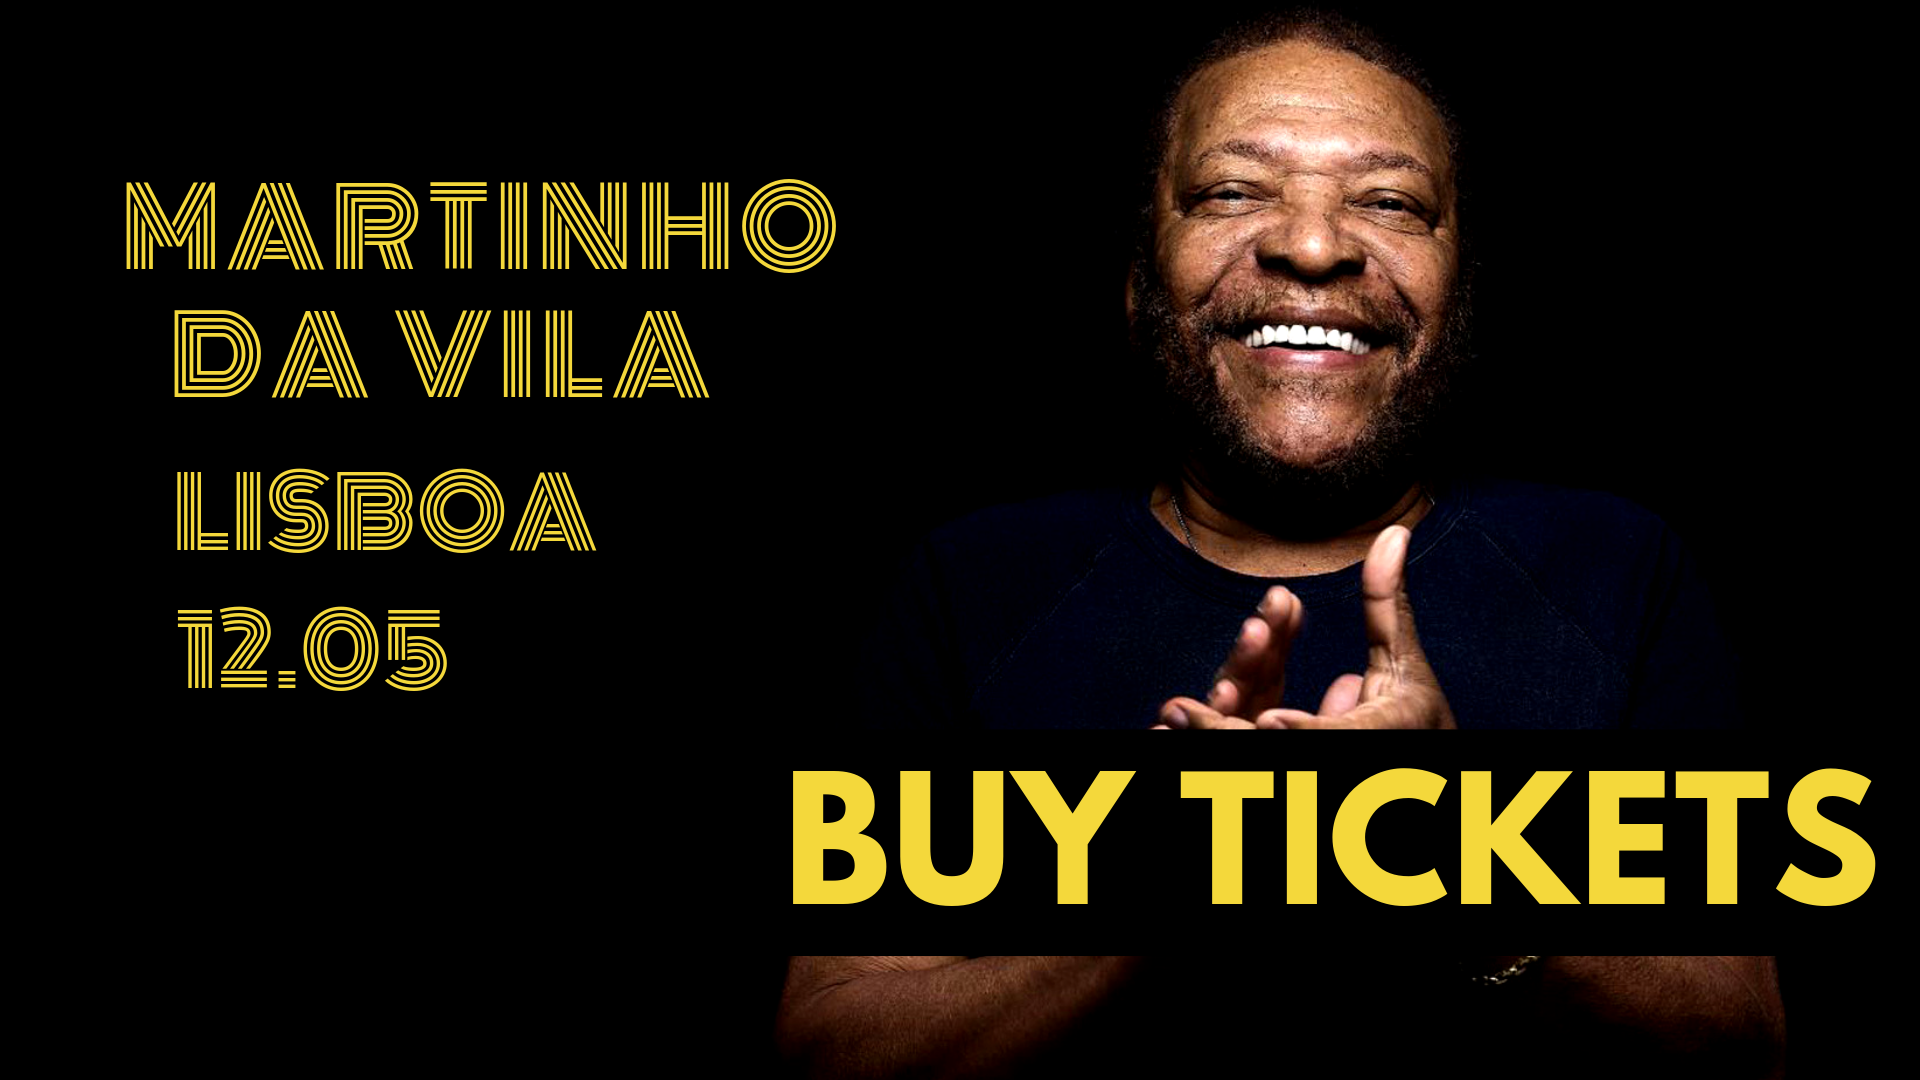 Martinho - Lisboa - Bilhetespng